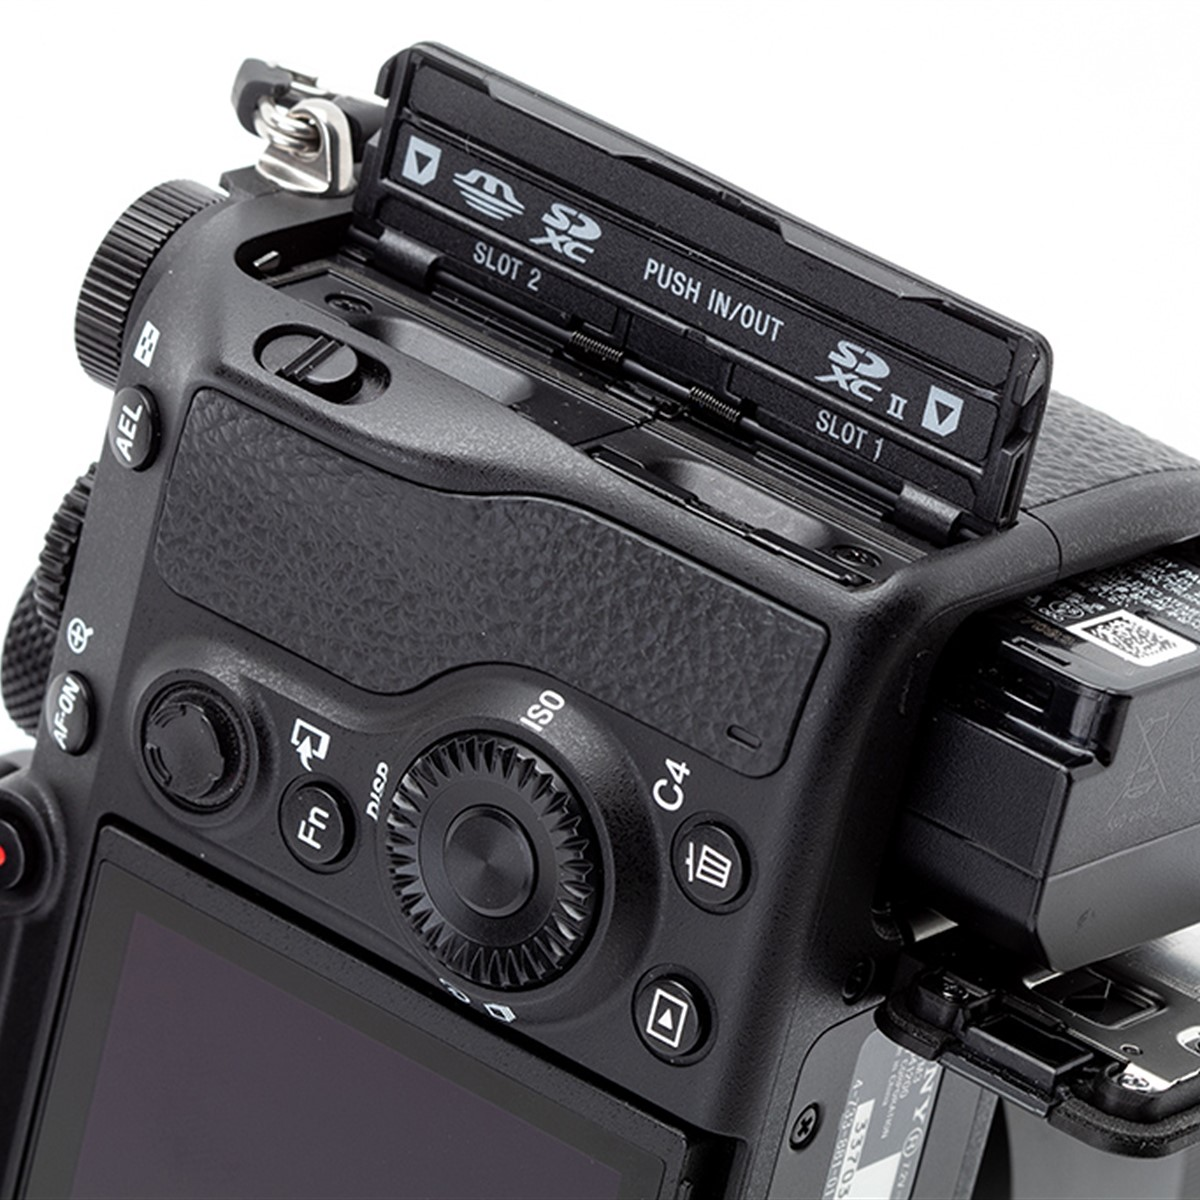 Memory Cards 2 Pack SDHC Pentax K-5 II Digital Camera Memory Card 2 x 16GB Secure Digital High Capacity